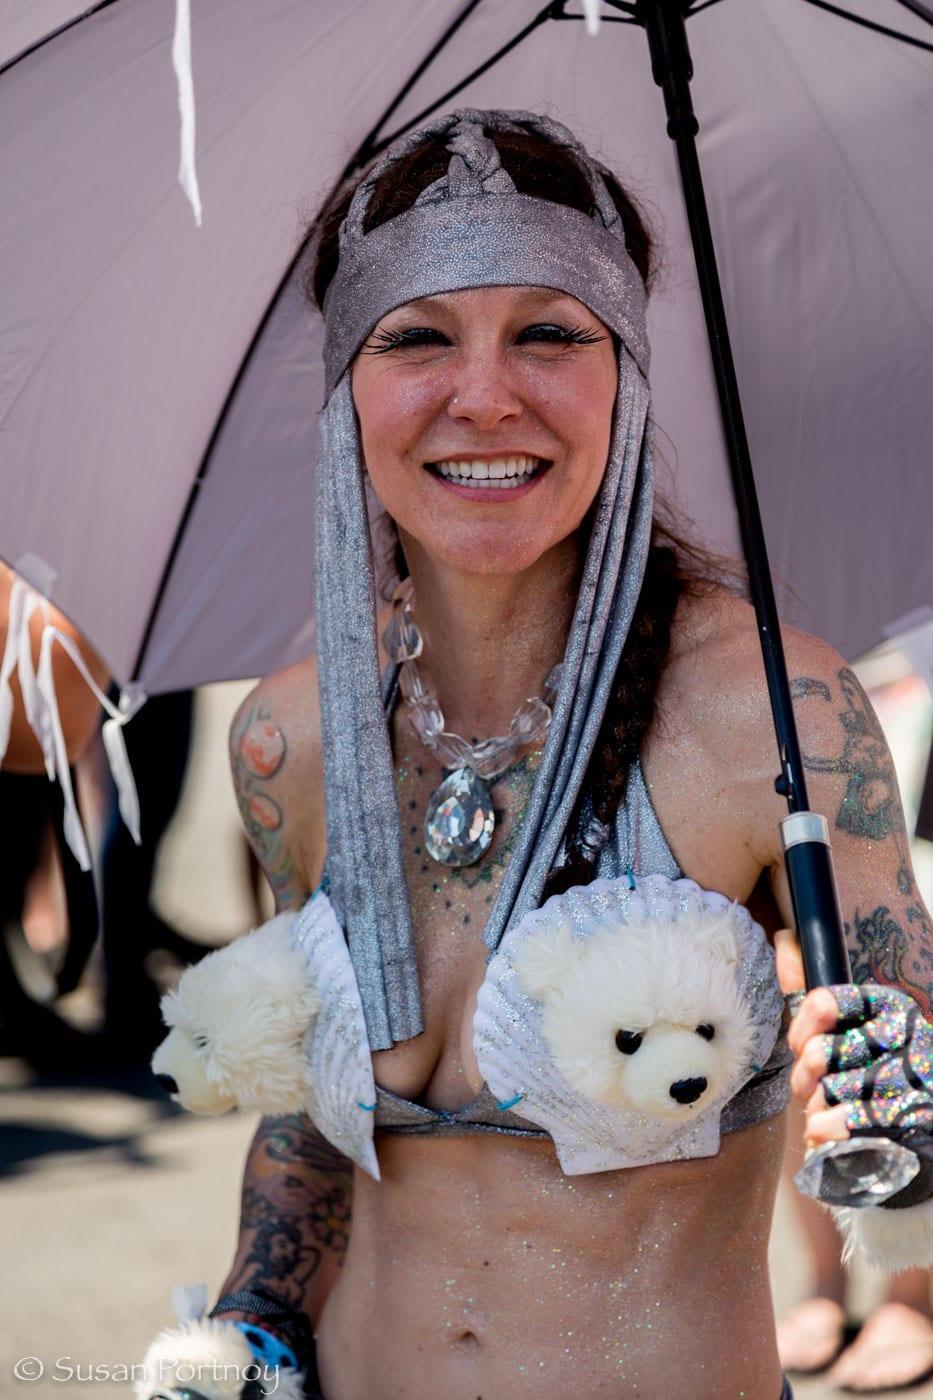 Coney IslandWoman dressed as a polarbear mermaidMermaid Parade 2016